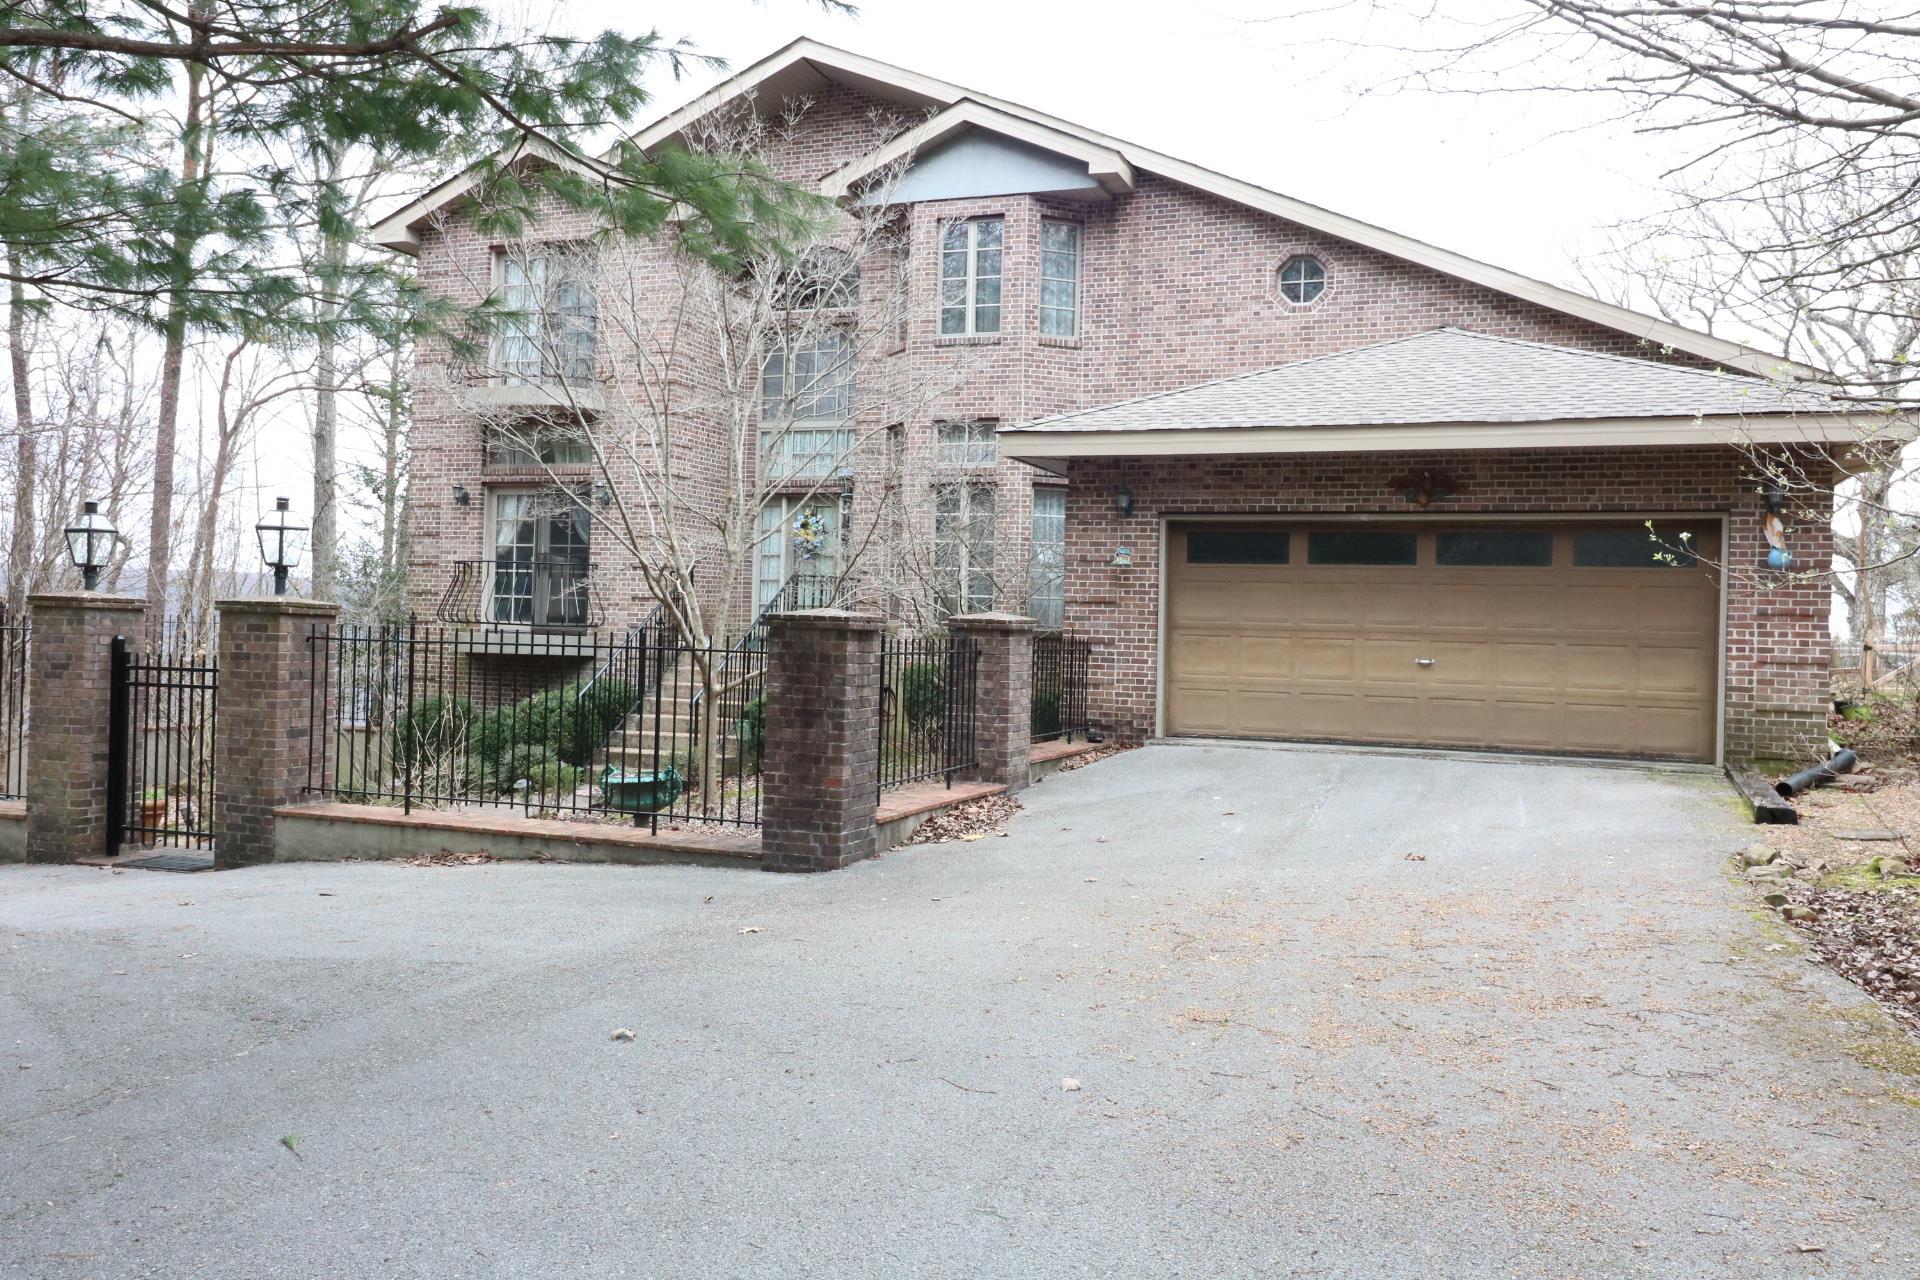 2022 Clifftops Ave, Monteagle, TN 37356 - Monteagle, TN real estate listing